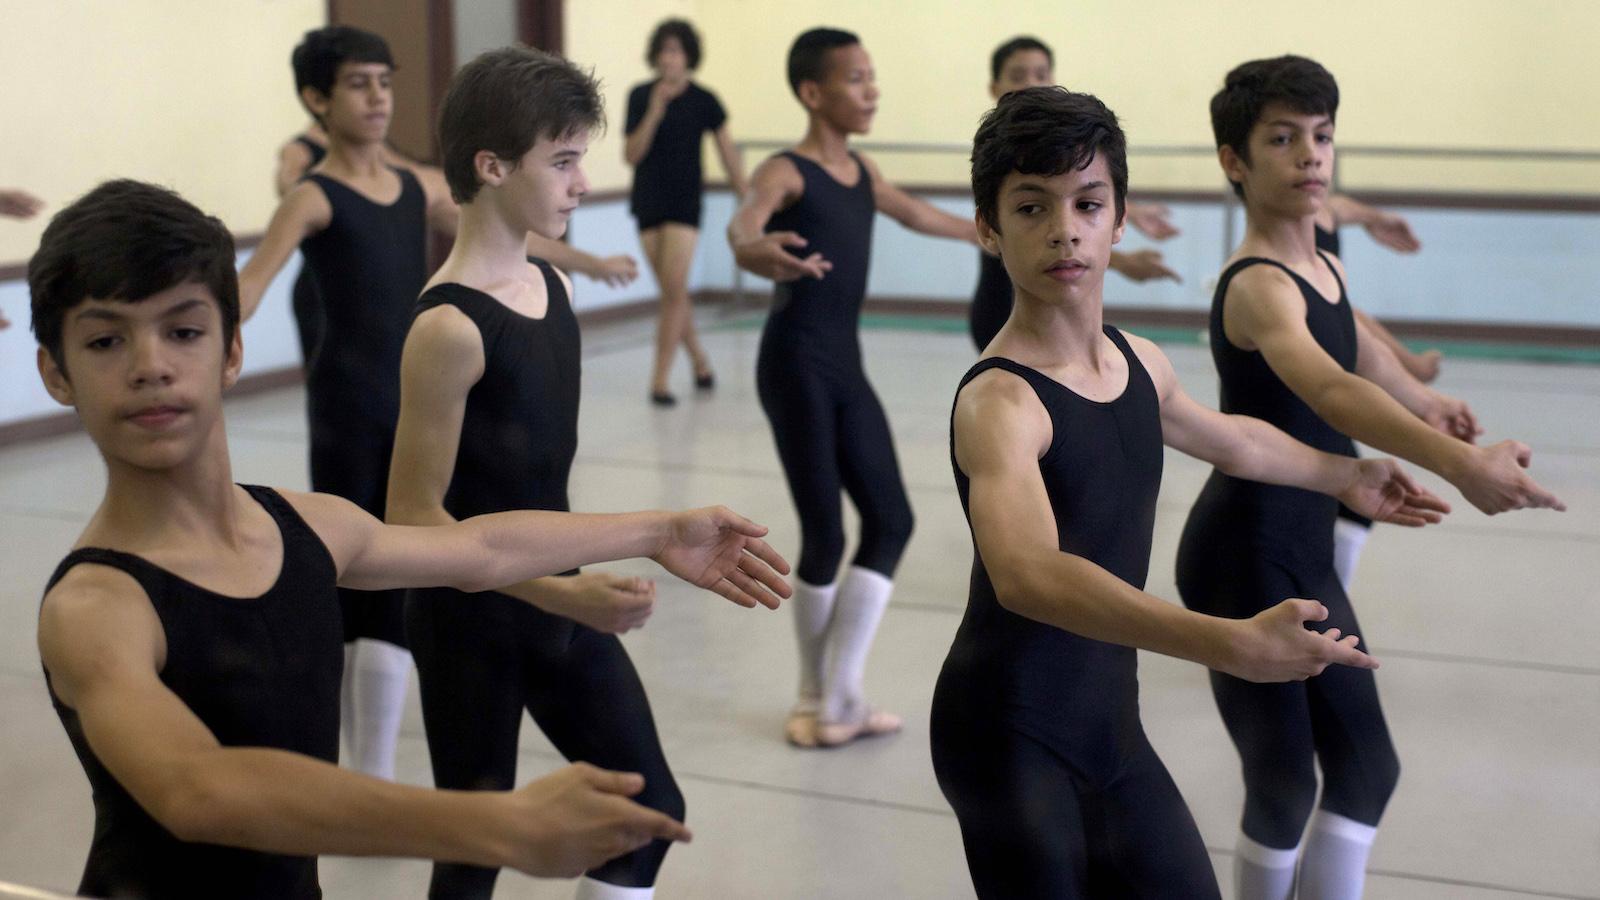 triplets dance ballet